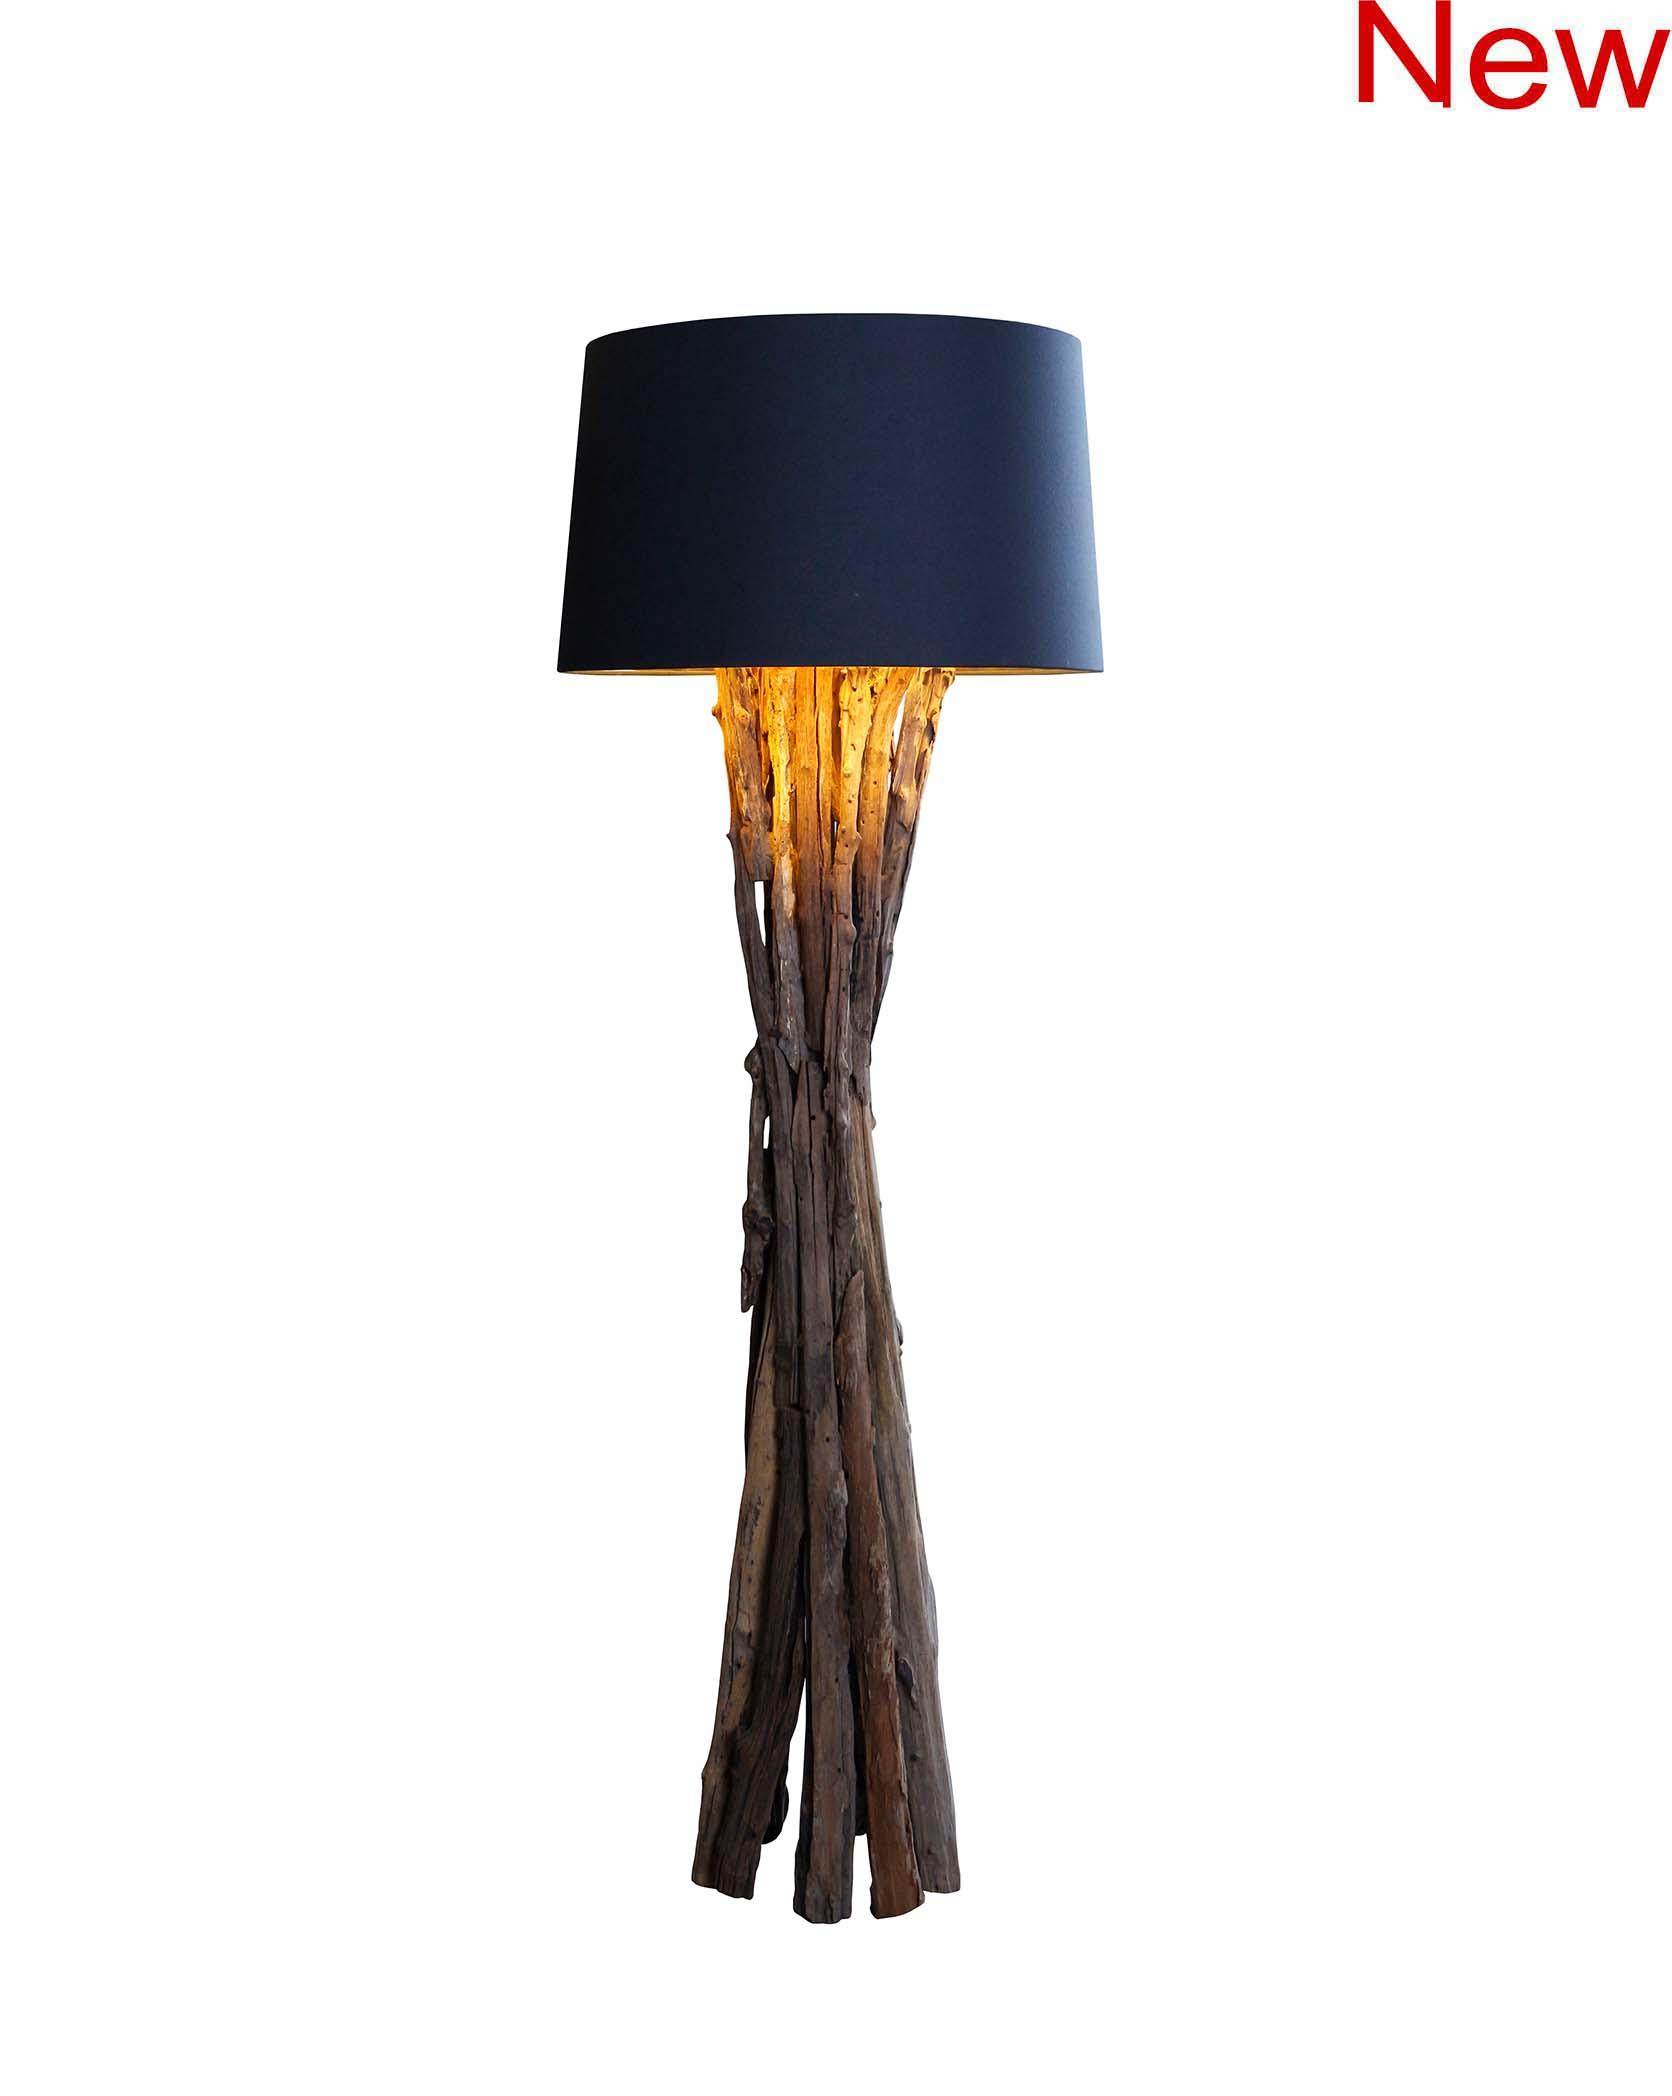 Rough wood floor lamp product photo #2